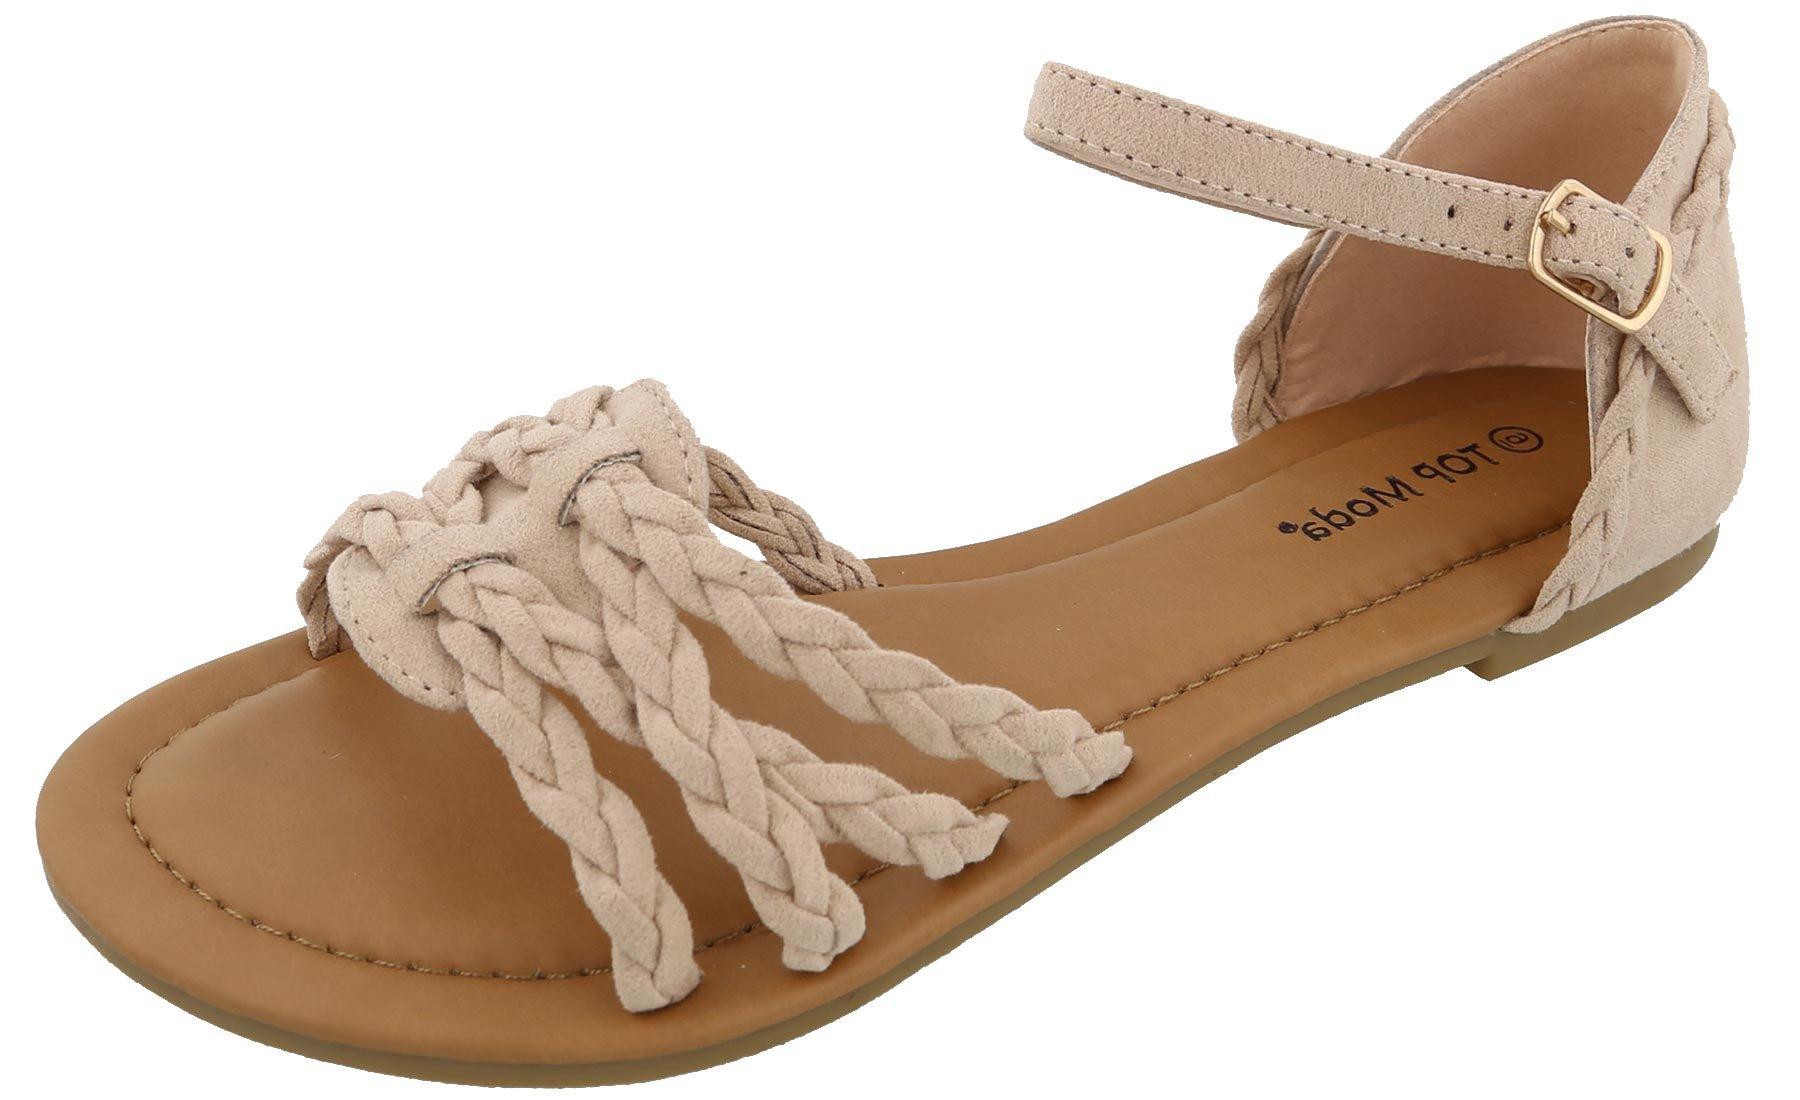 Top Moda Women's Braided Strappy Flat Sandal (7 B(M) US, Blush)